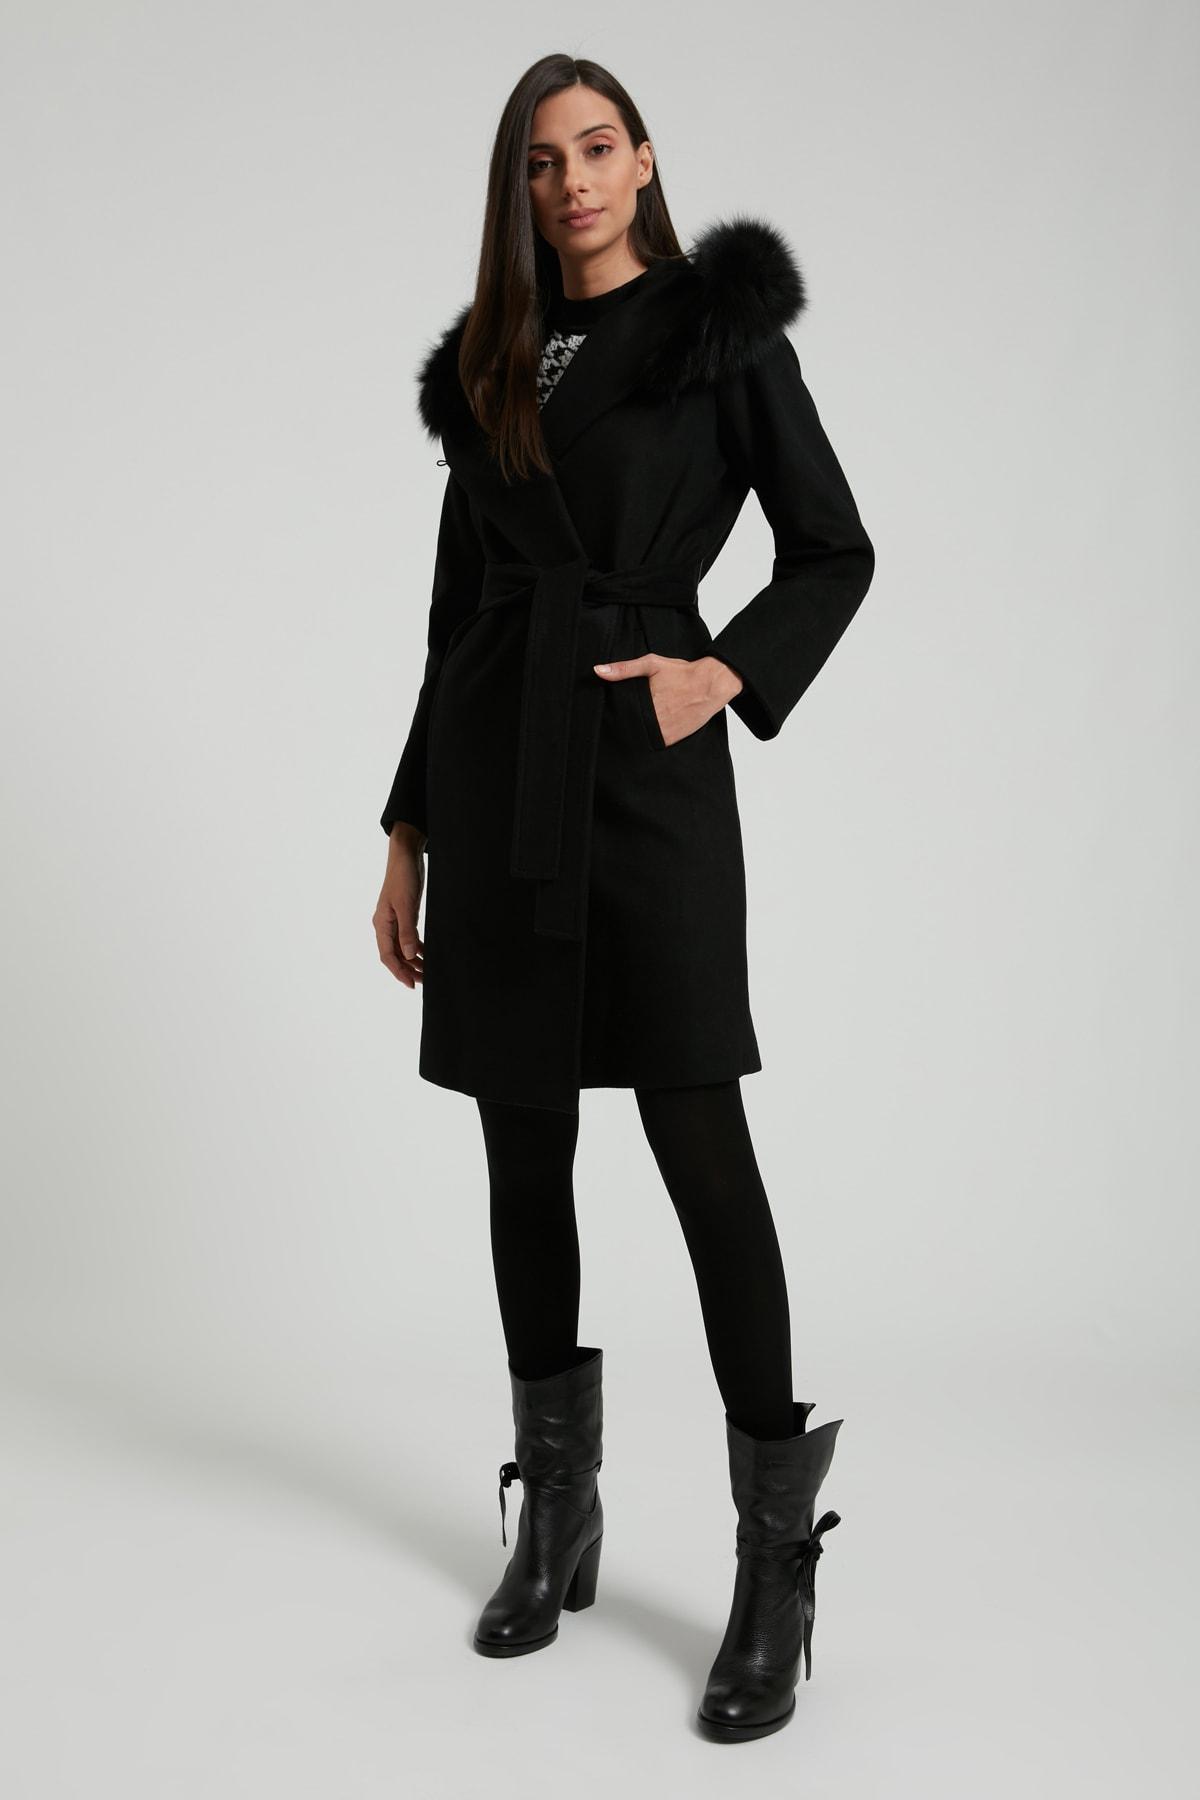 UTOPIAN Kadın Siyah Kapüşonlu Punto Dikişli Kürklü Kaban 1